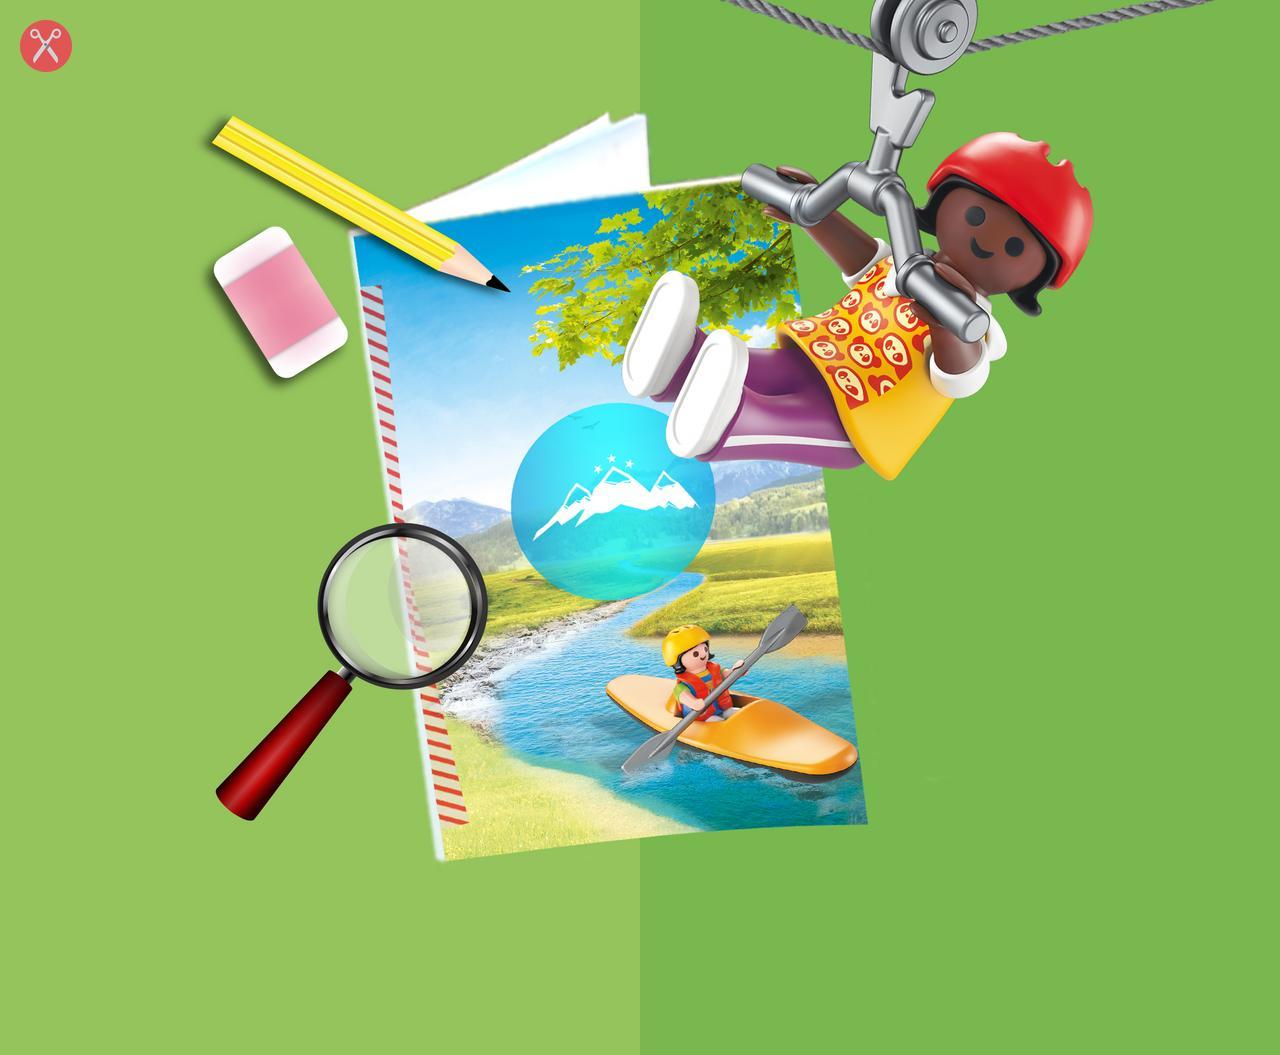 Playmobil Ausmalbilder Online : Playmobil Usa